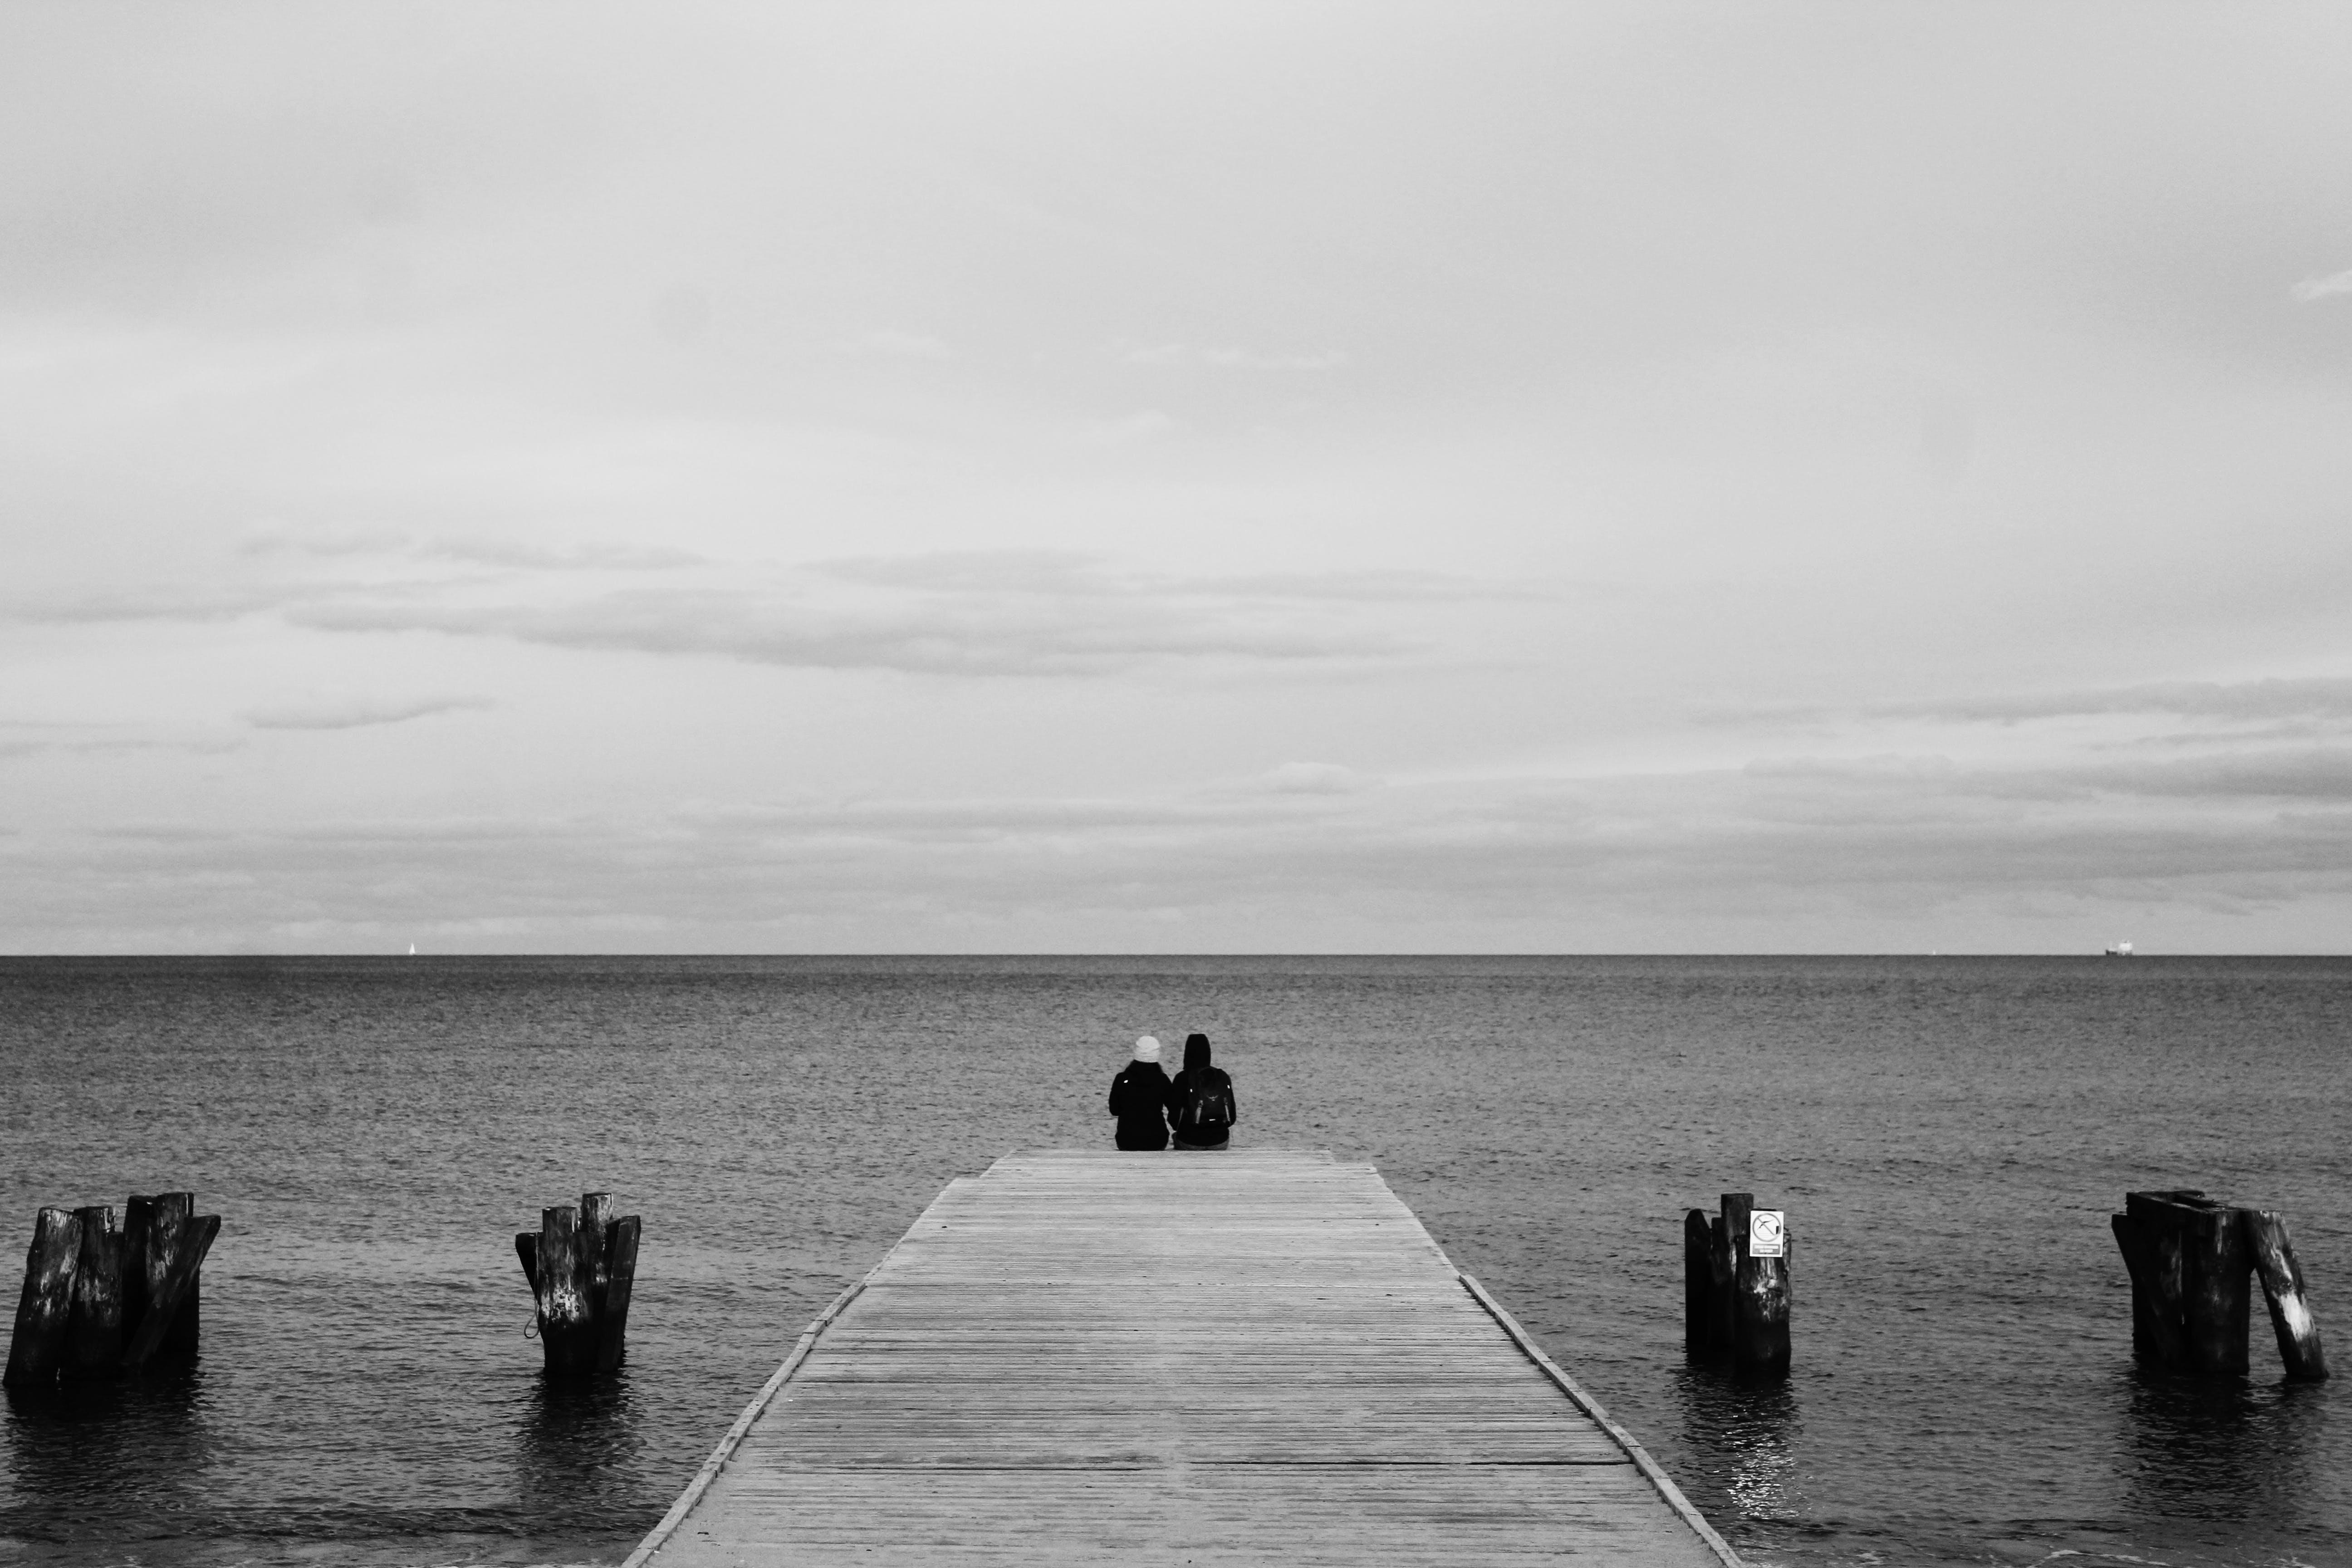 Grayscale Photography of Couple Sitting on Wood Dock